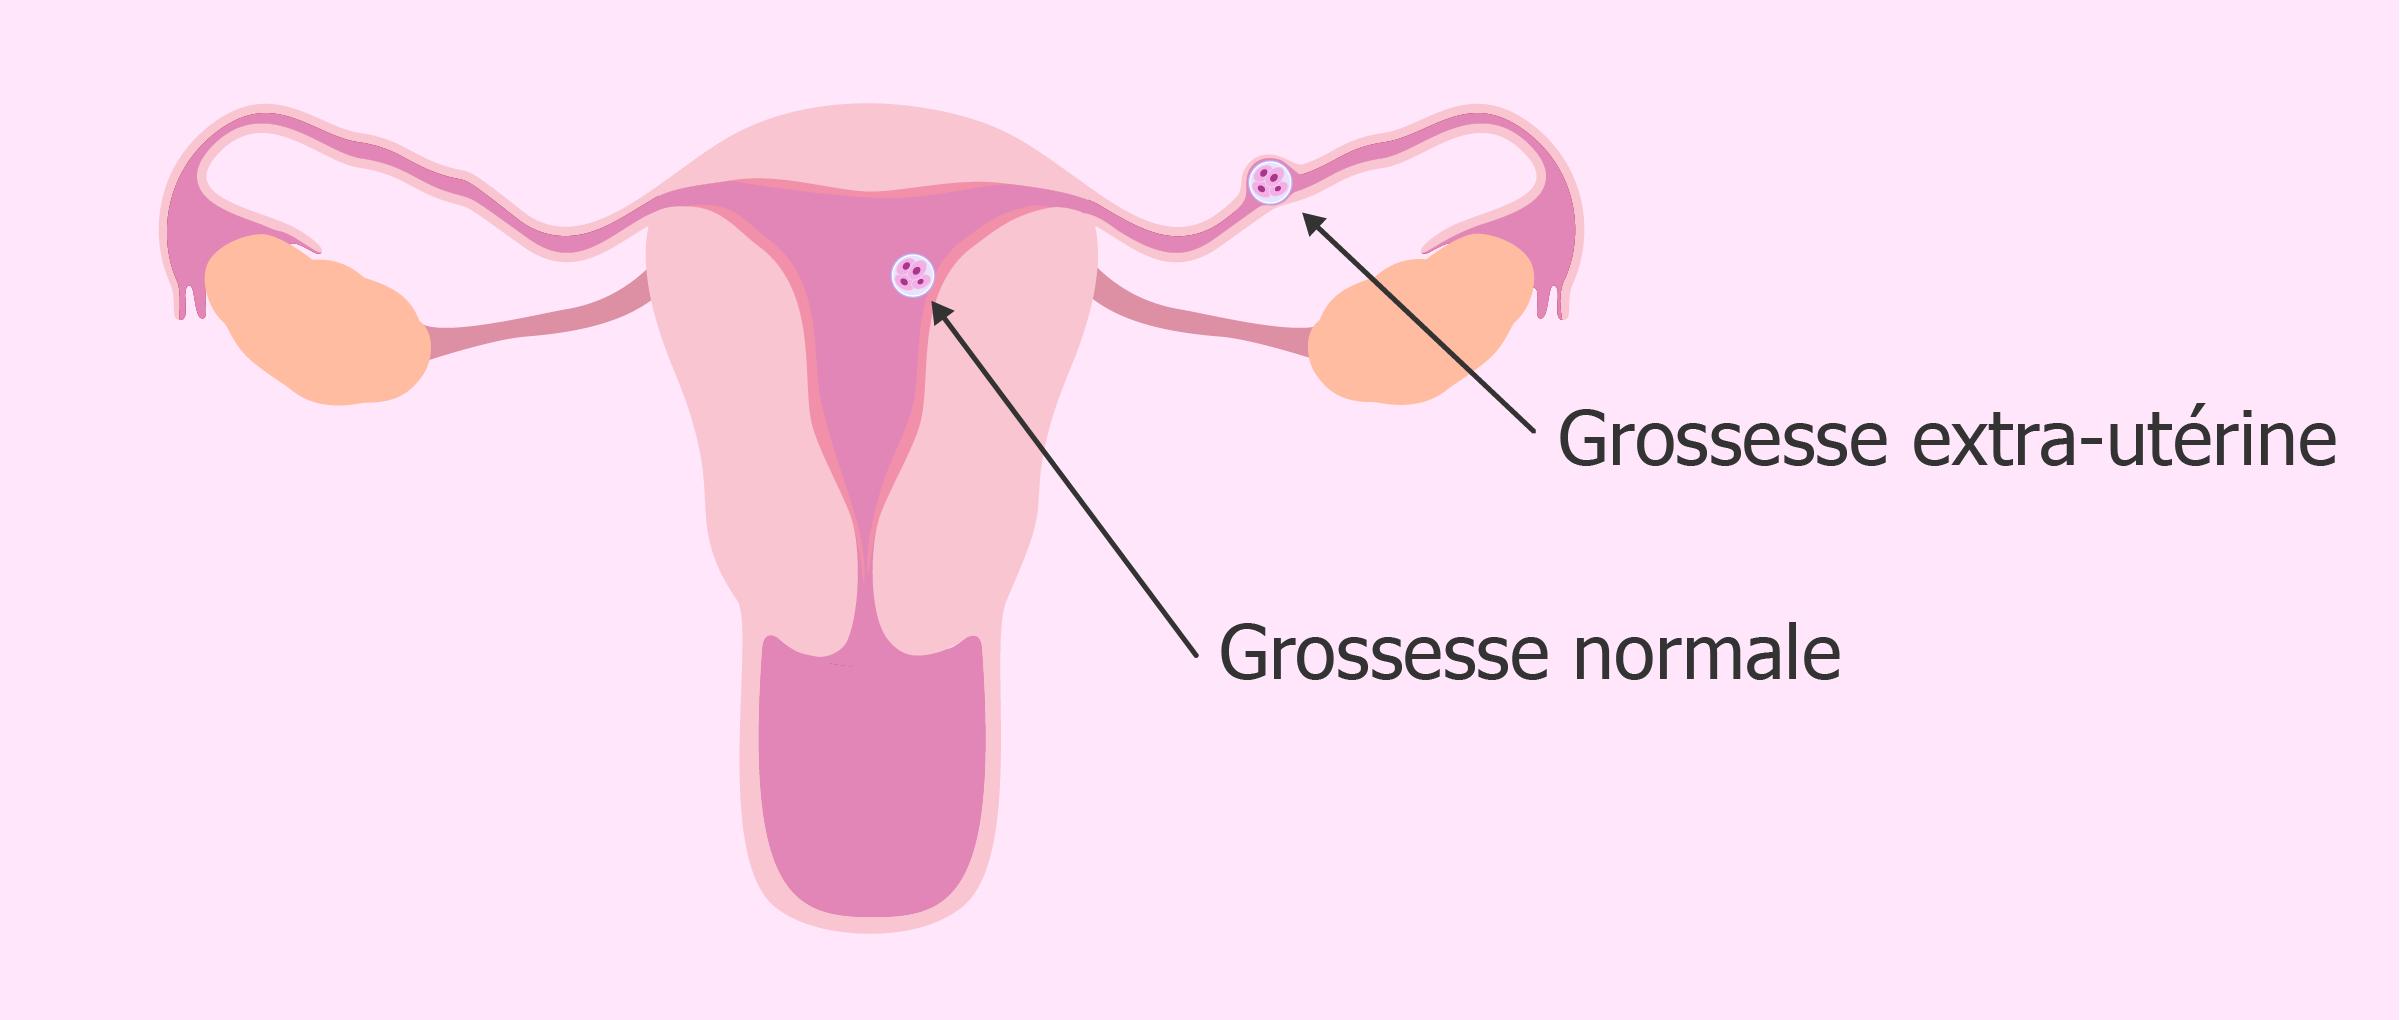 Grossesse extra-utérine après un transfert embryonnaire